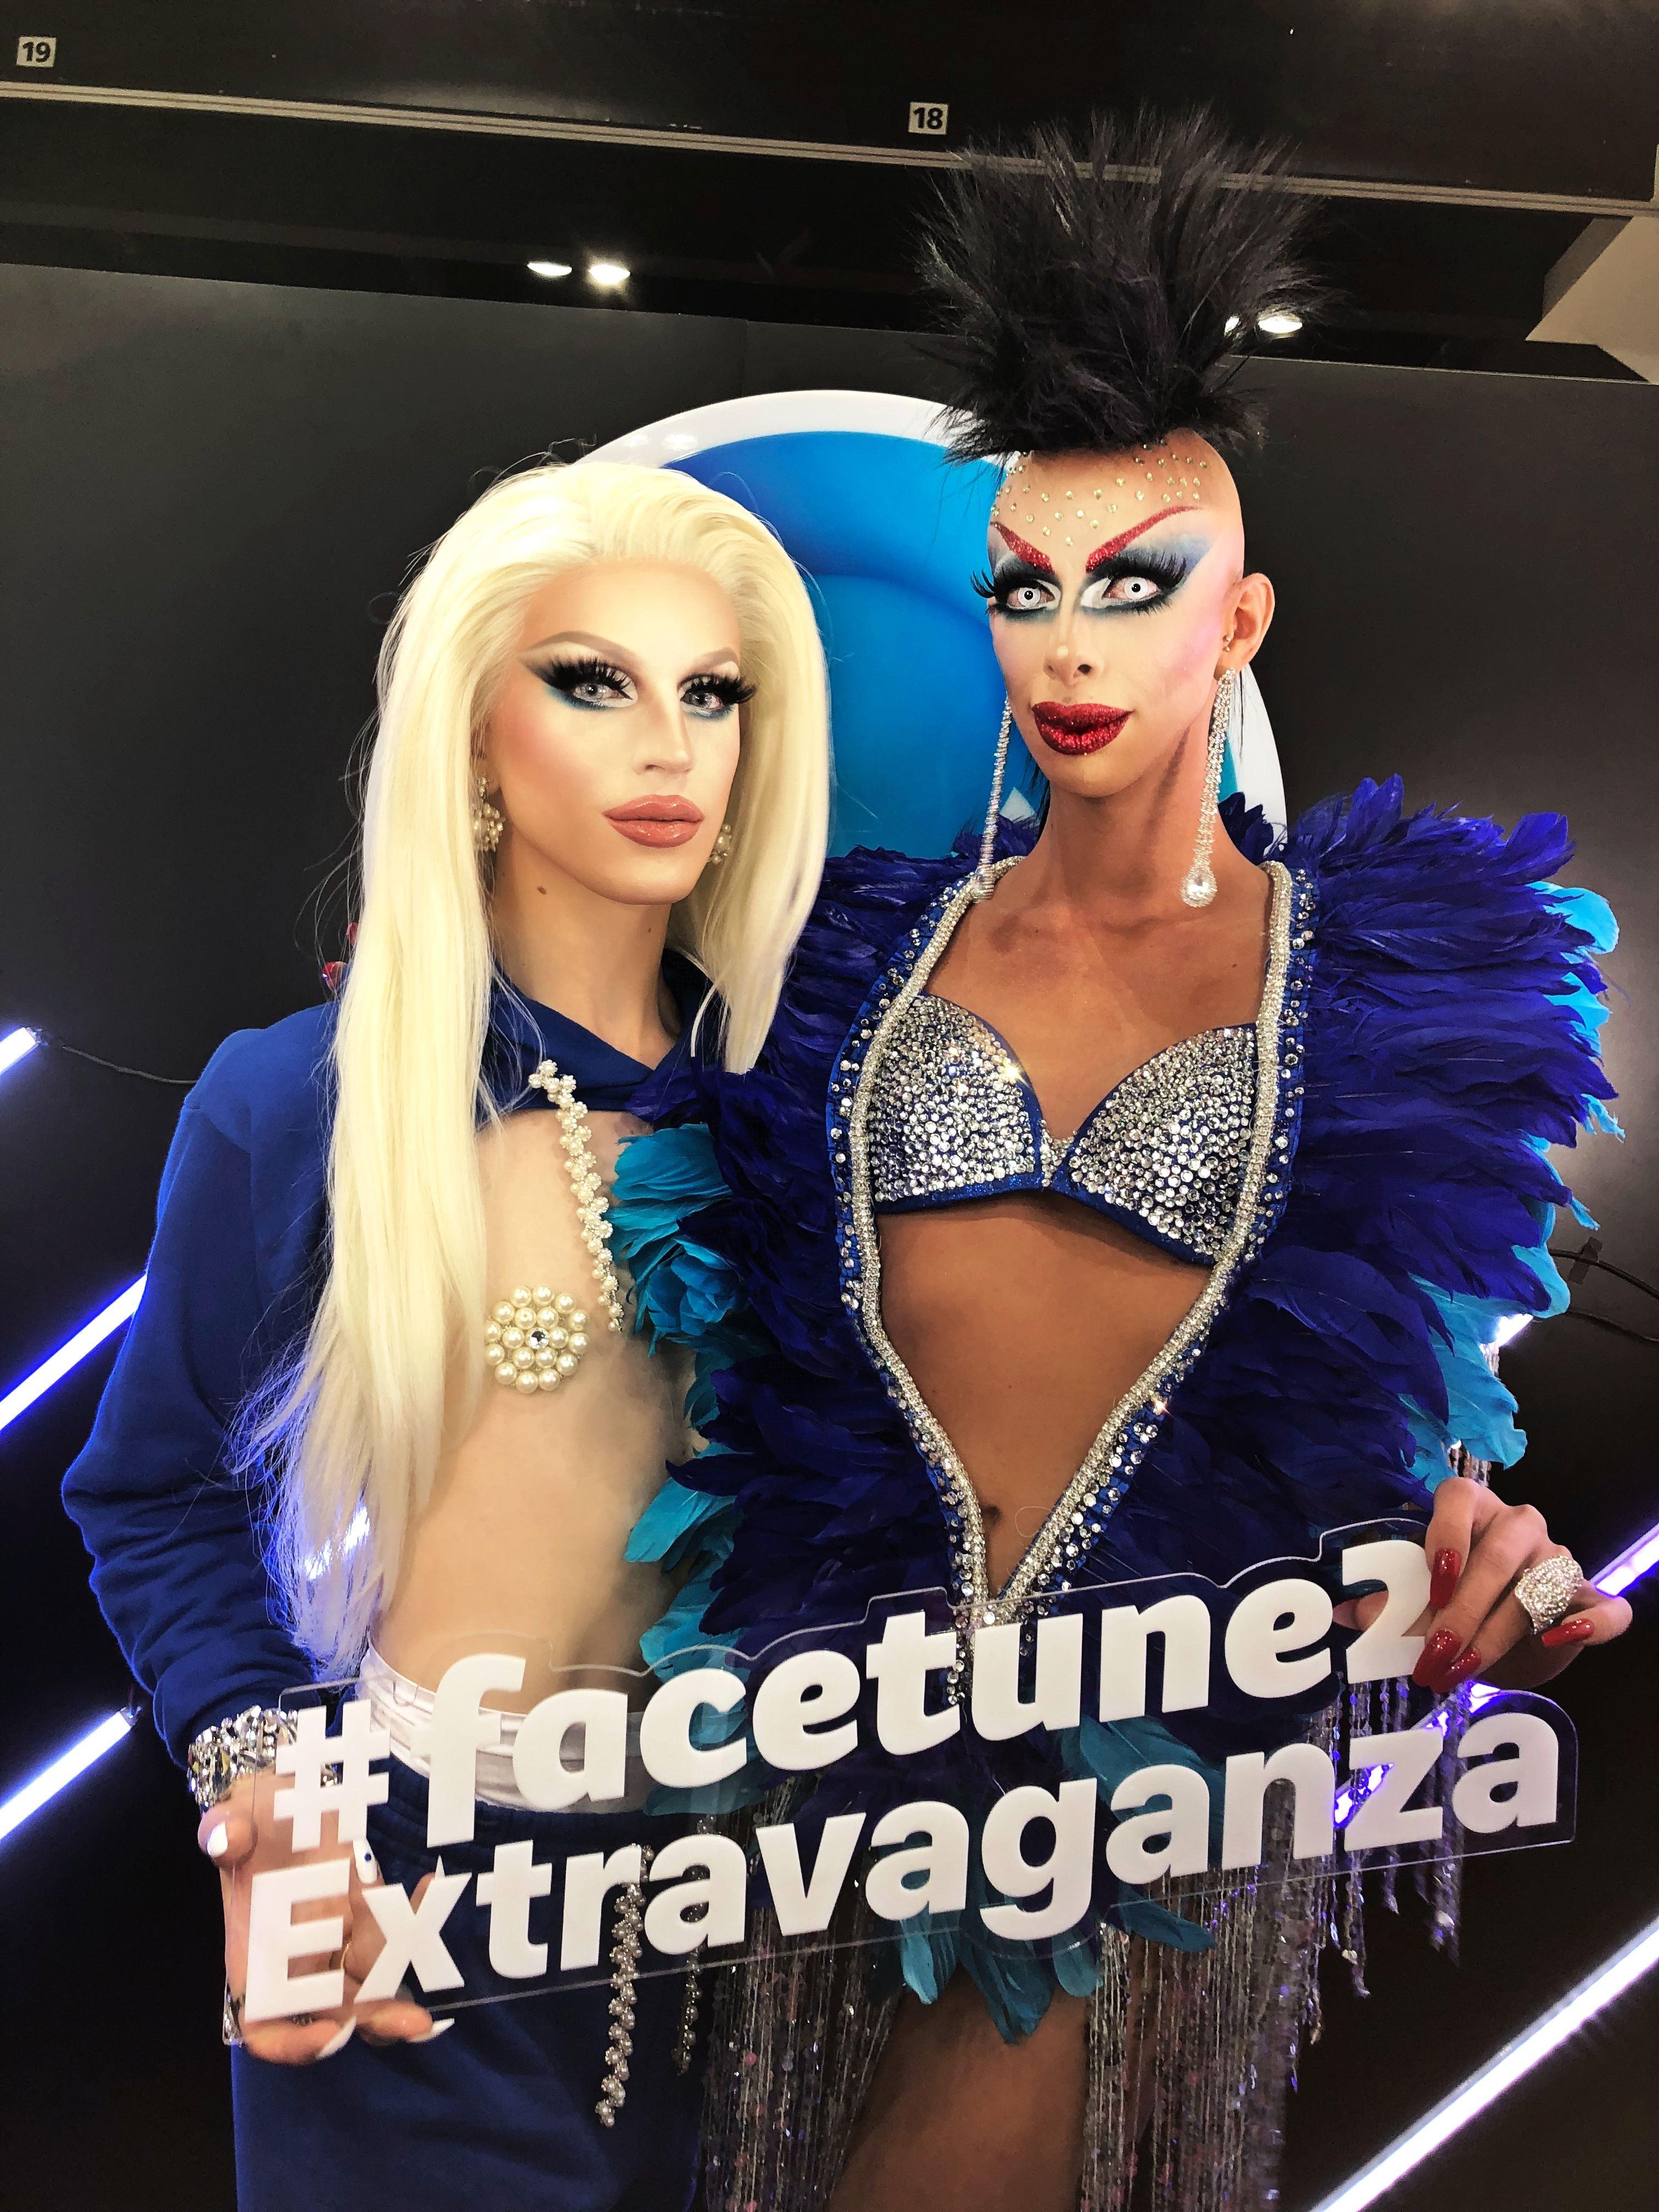 Aquaria with Israeli Drag Queen Aviv Hanoch with FaceTune at RuPaul's DragCon LA 2018 (courtesy Lightricks)